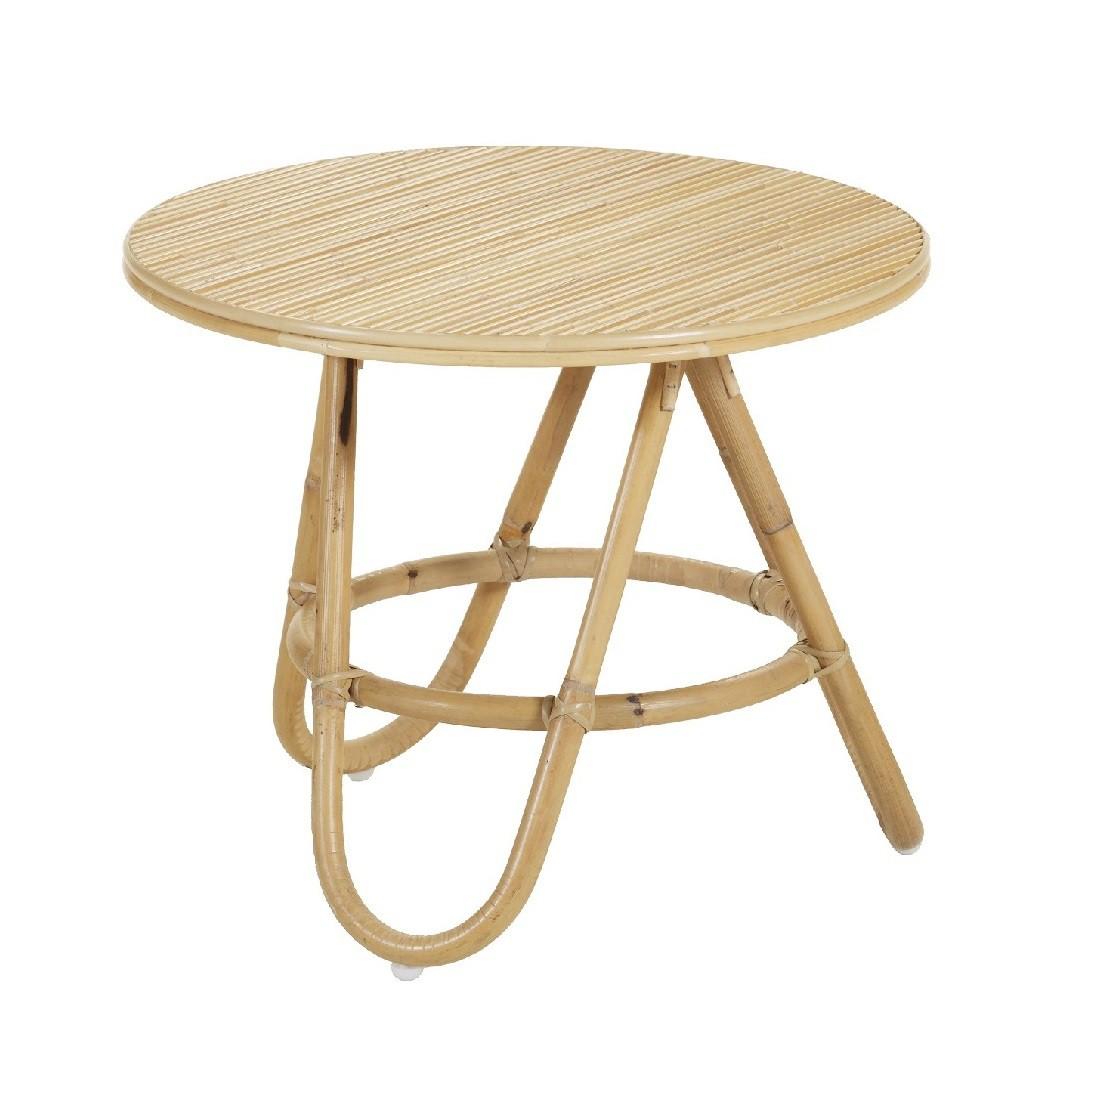 table basse en rotin naturel et plateau rotin naturel diabolo. Black Bedroom Furniture Sets. Home Design Ideas